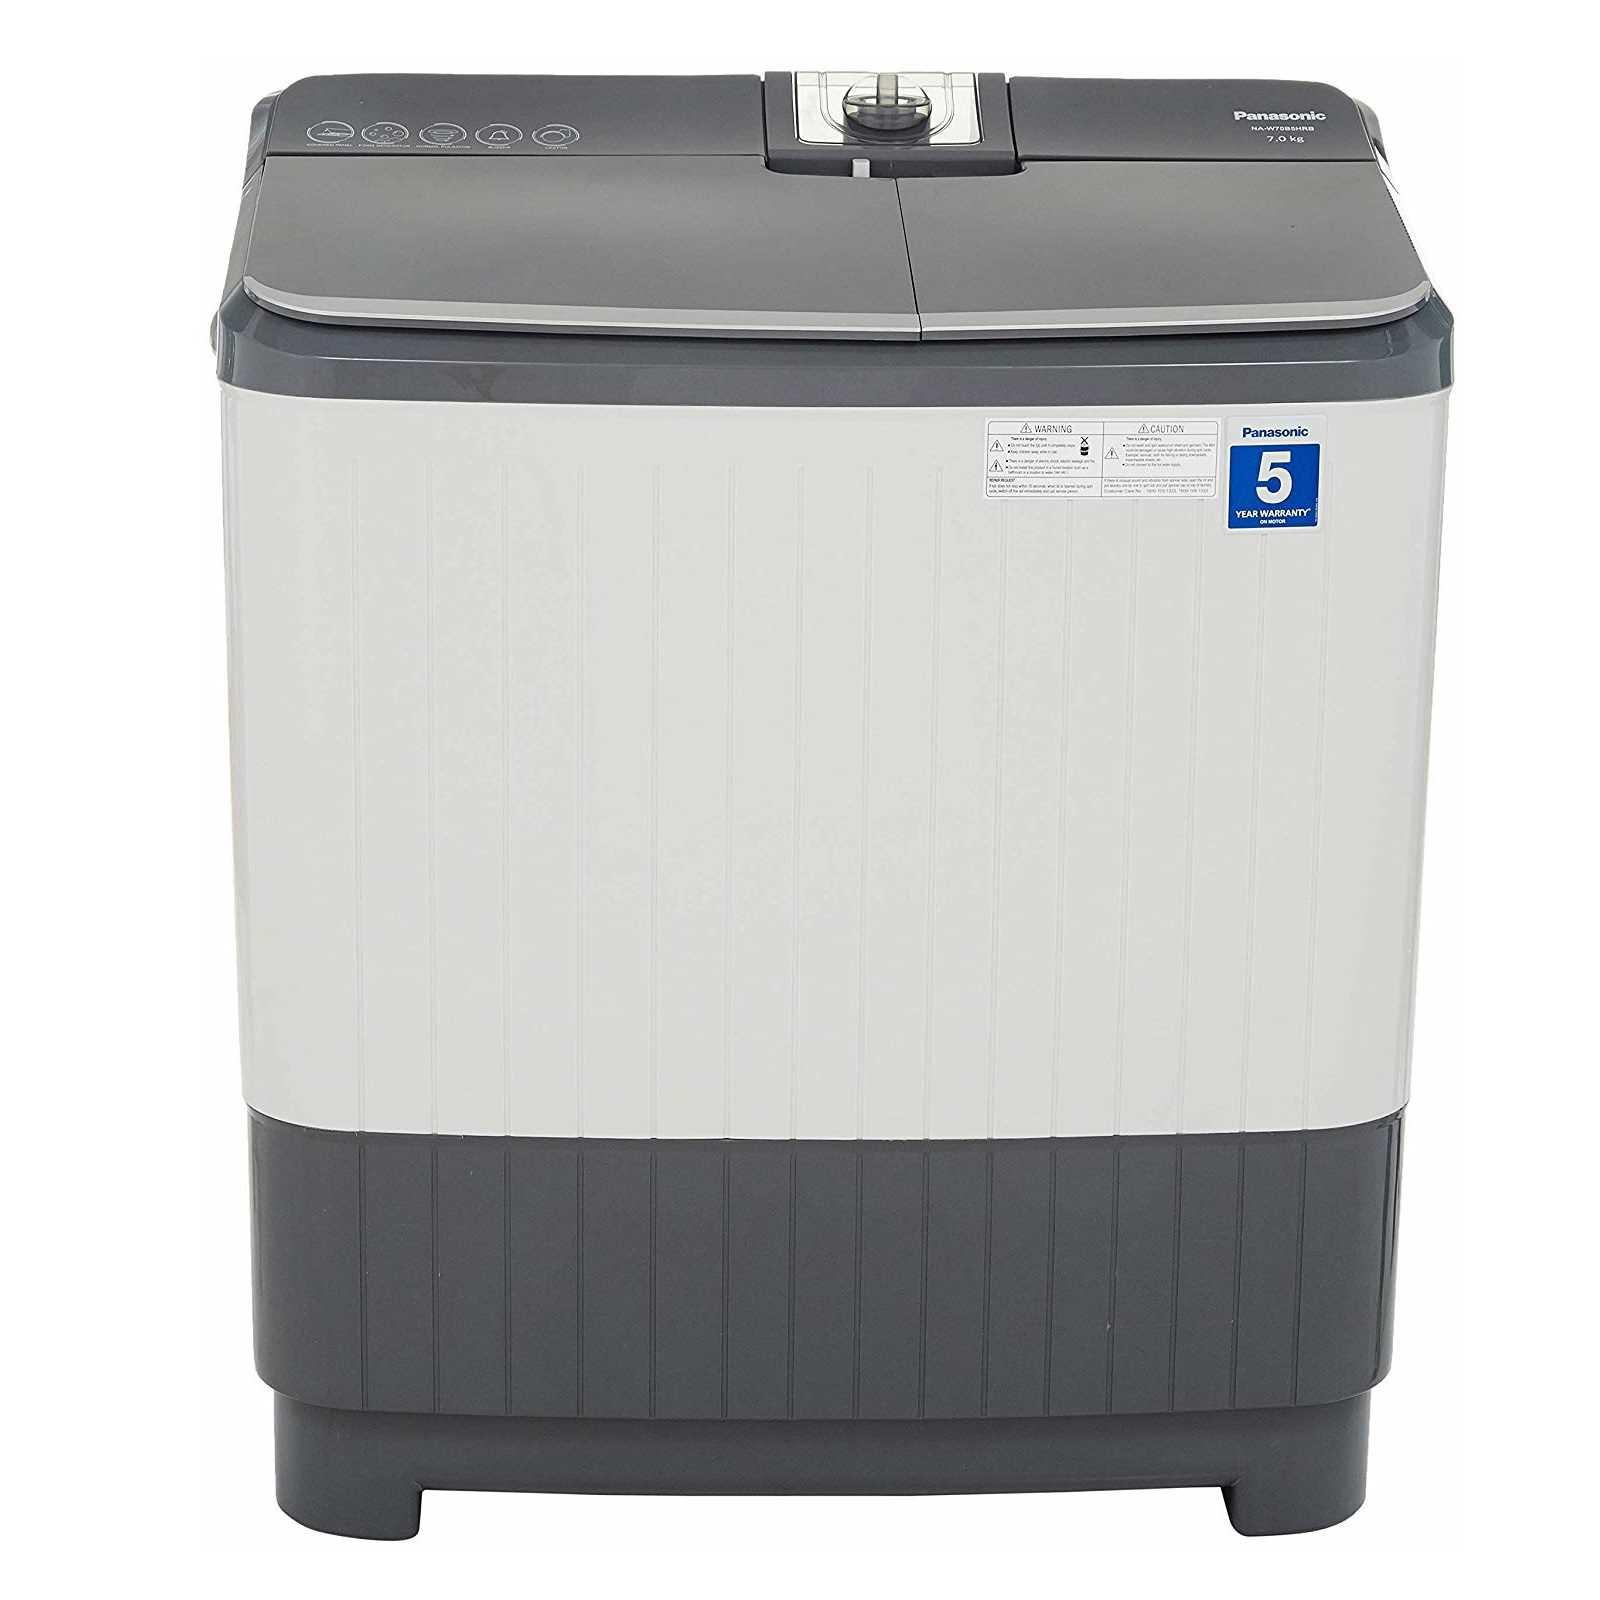 Panasonic NA W70B5HRB 7 Kg Semi Automatic Top Loading Washing Machine